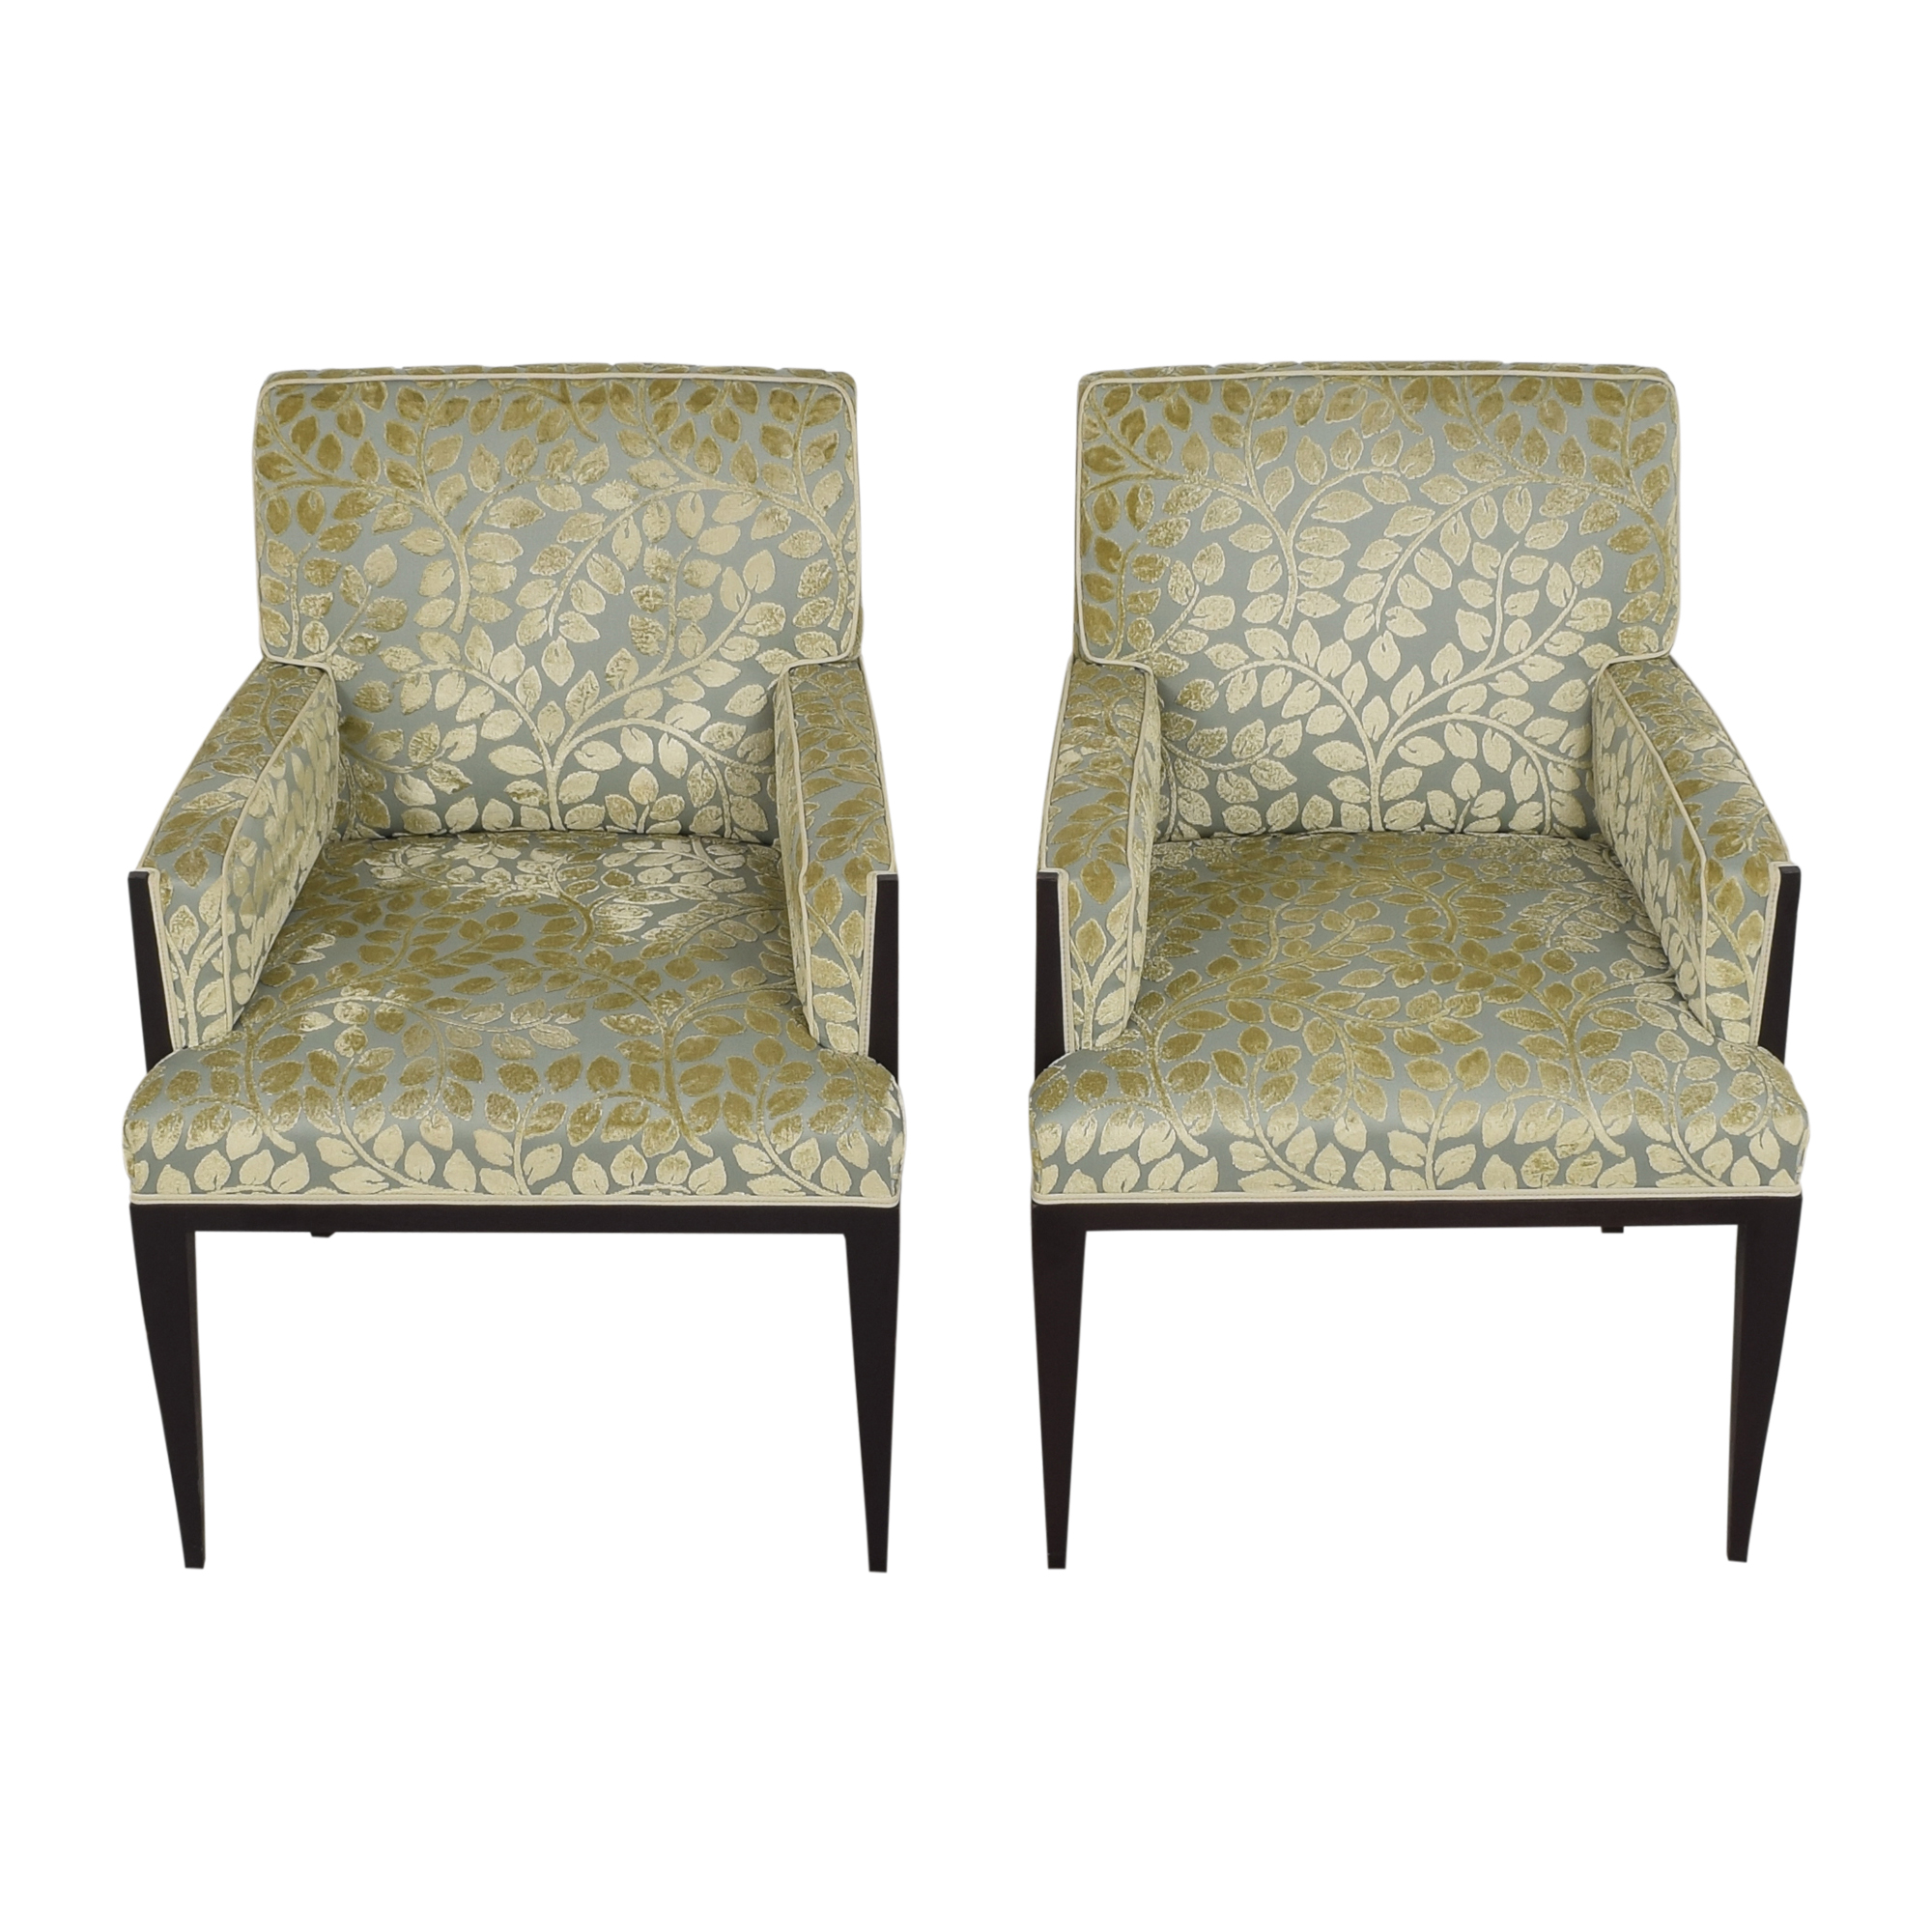 Mattaliano Mattaliano Flea Market #1 Dining Arm Chairs ma